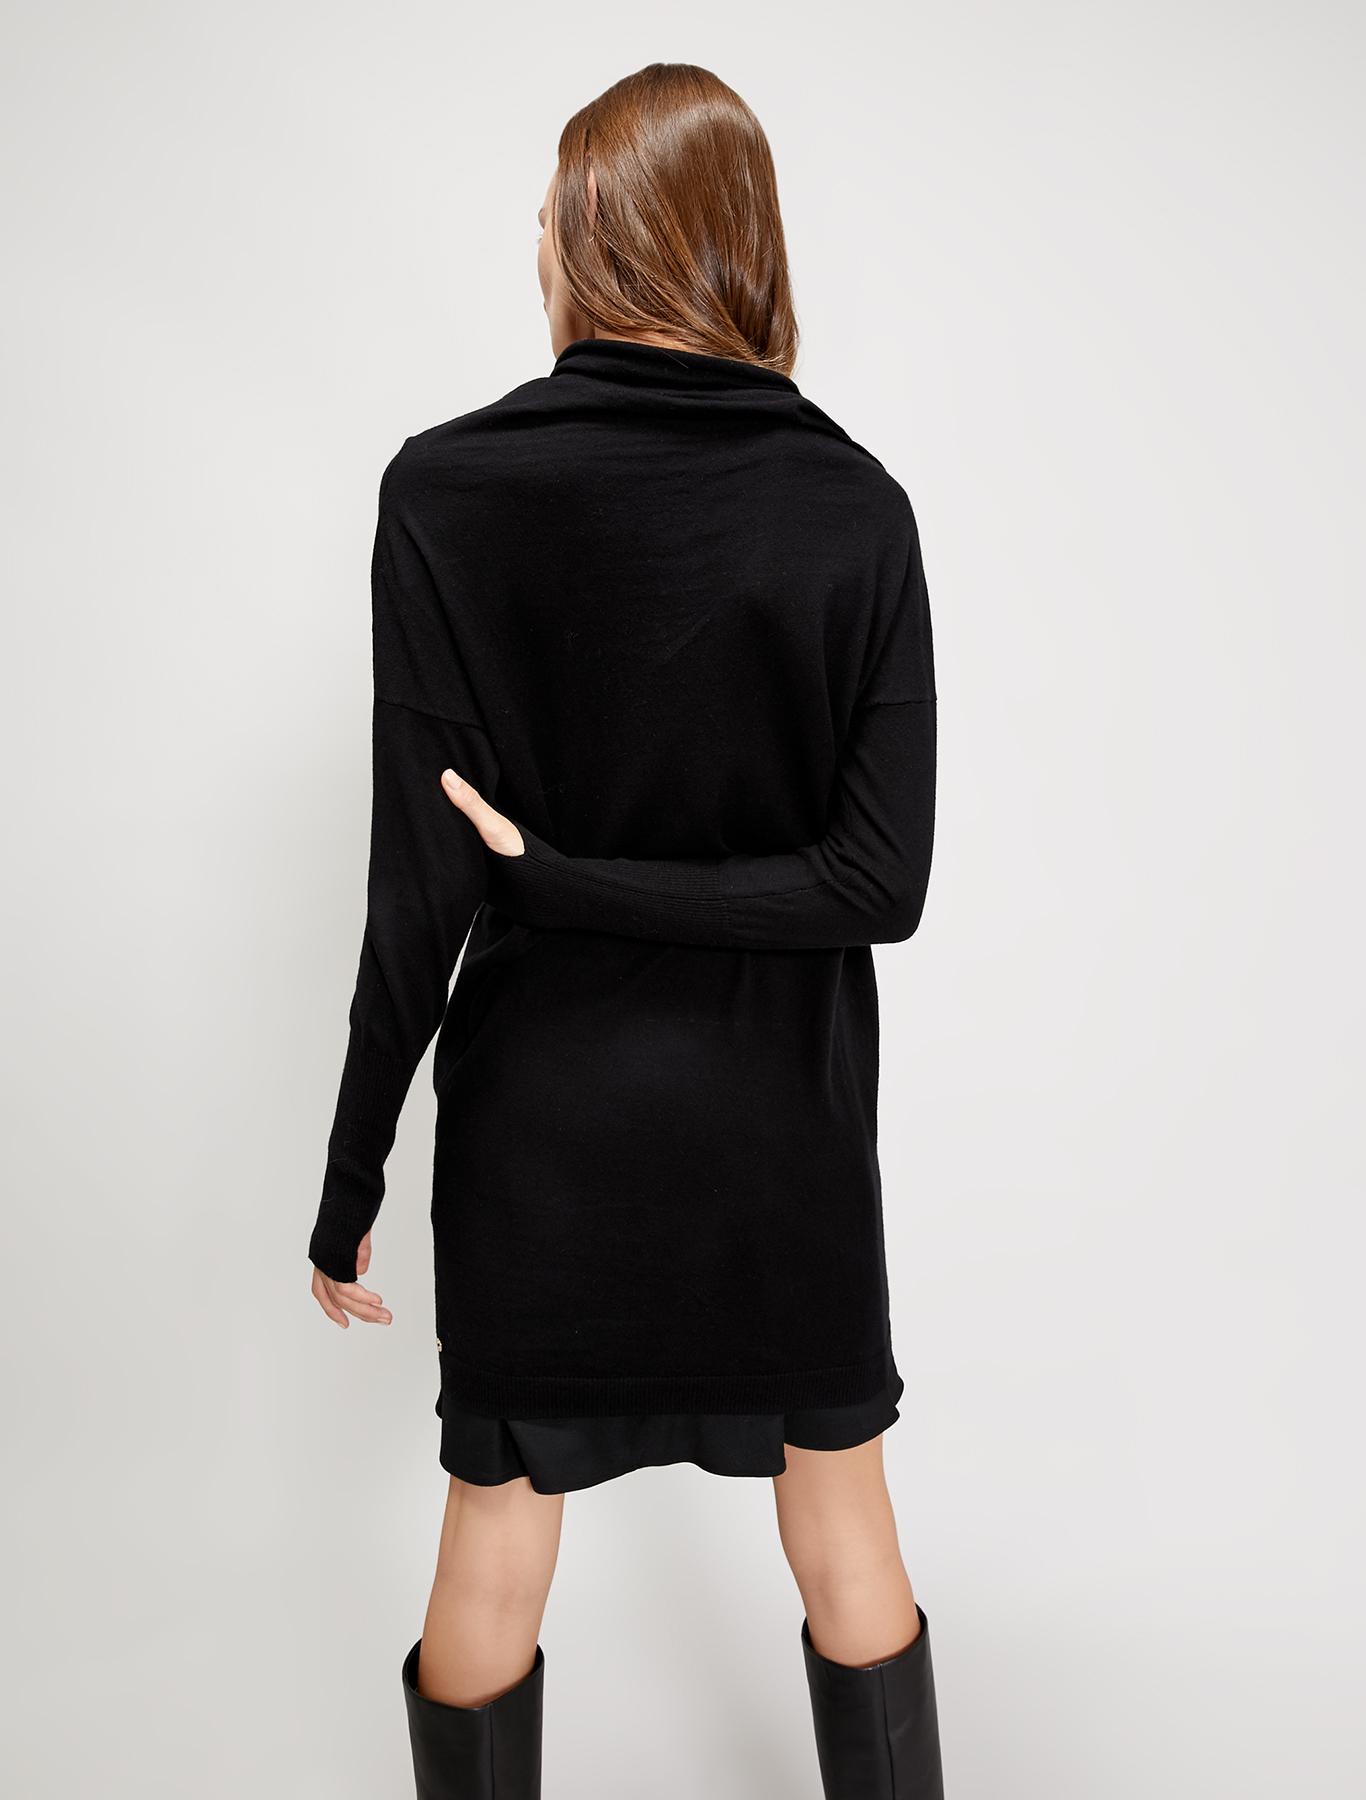 Cotton and cashmere jumper - black - pennyblack